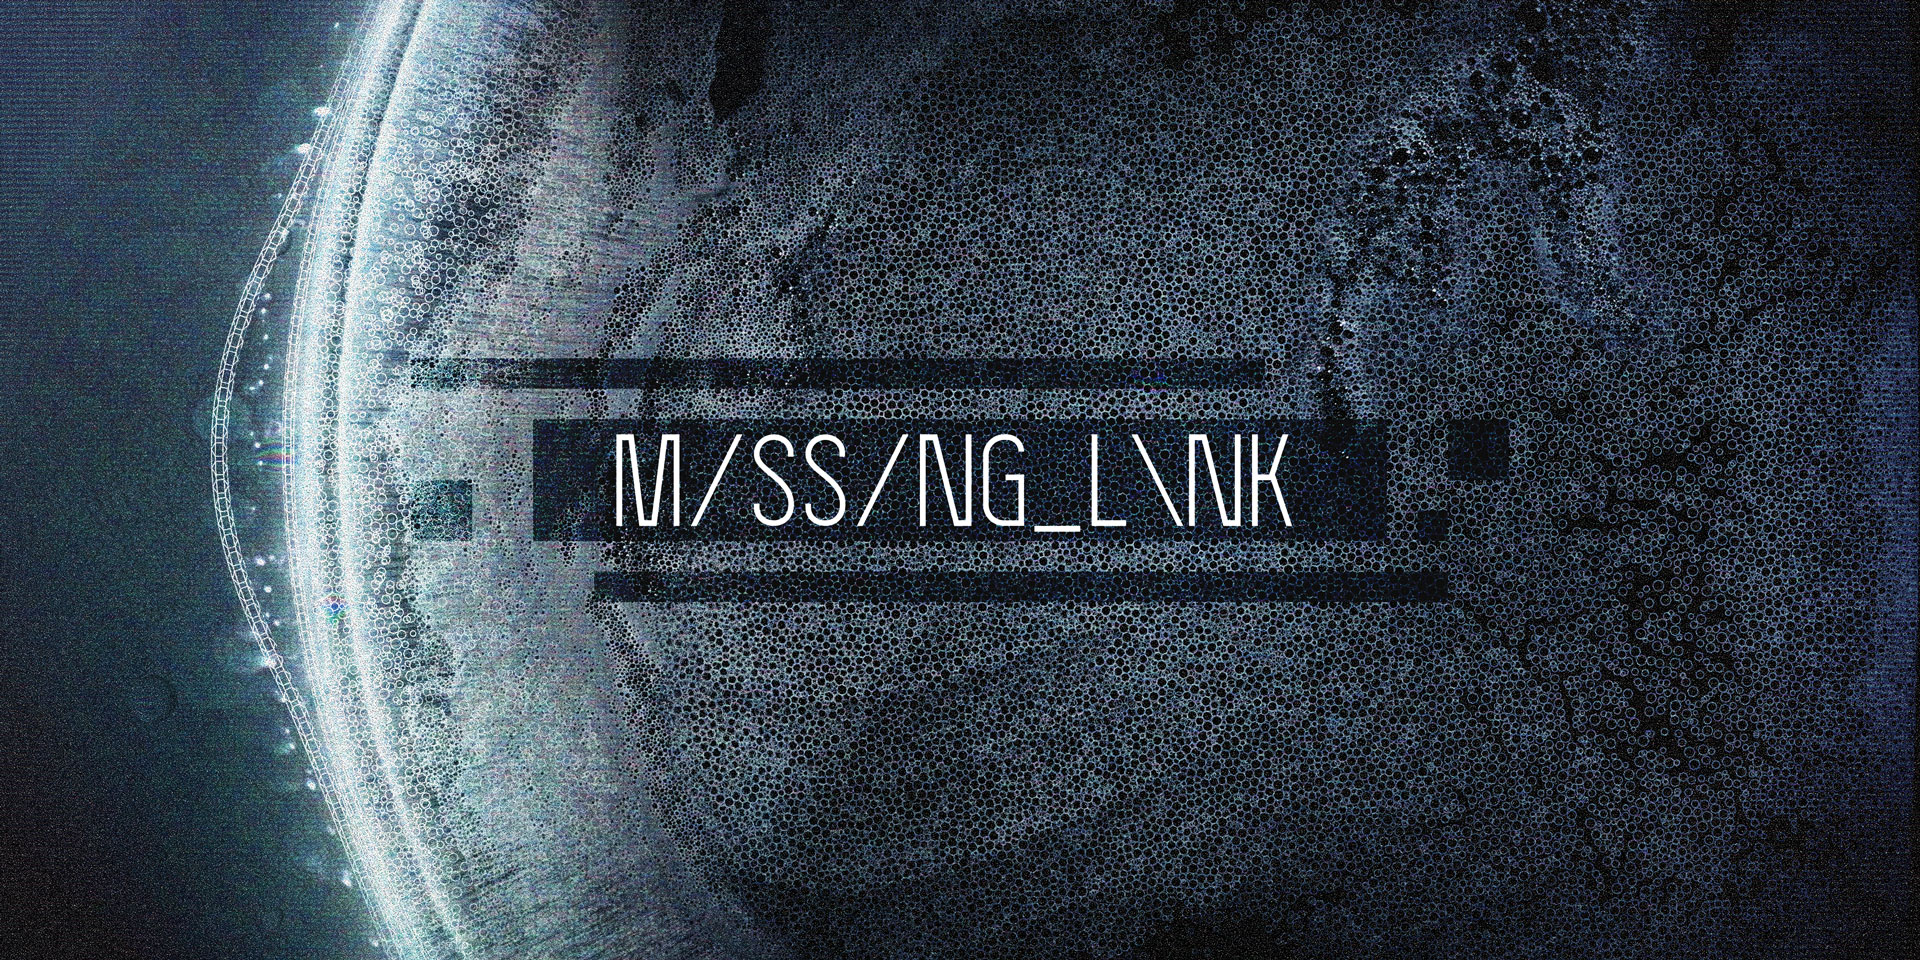 MSSNG_LNK_A_1920